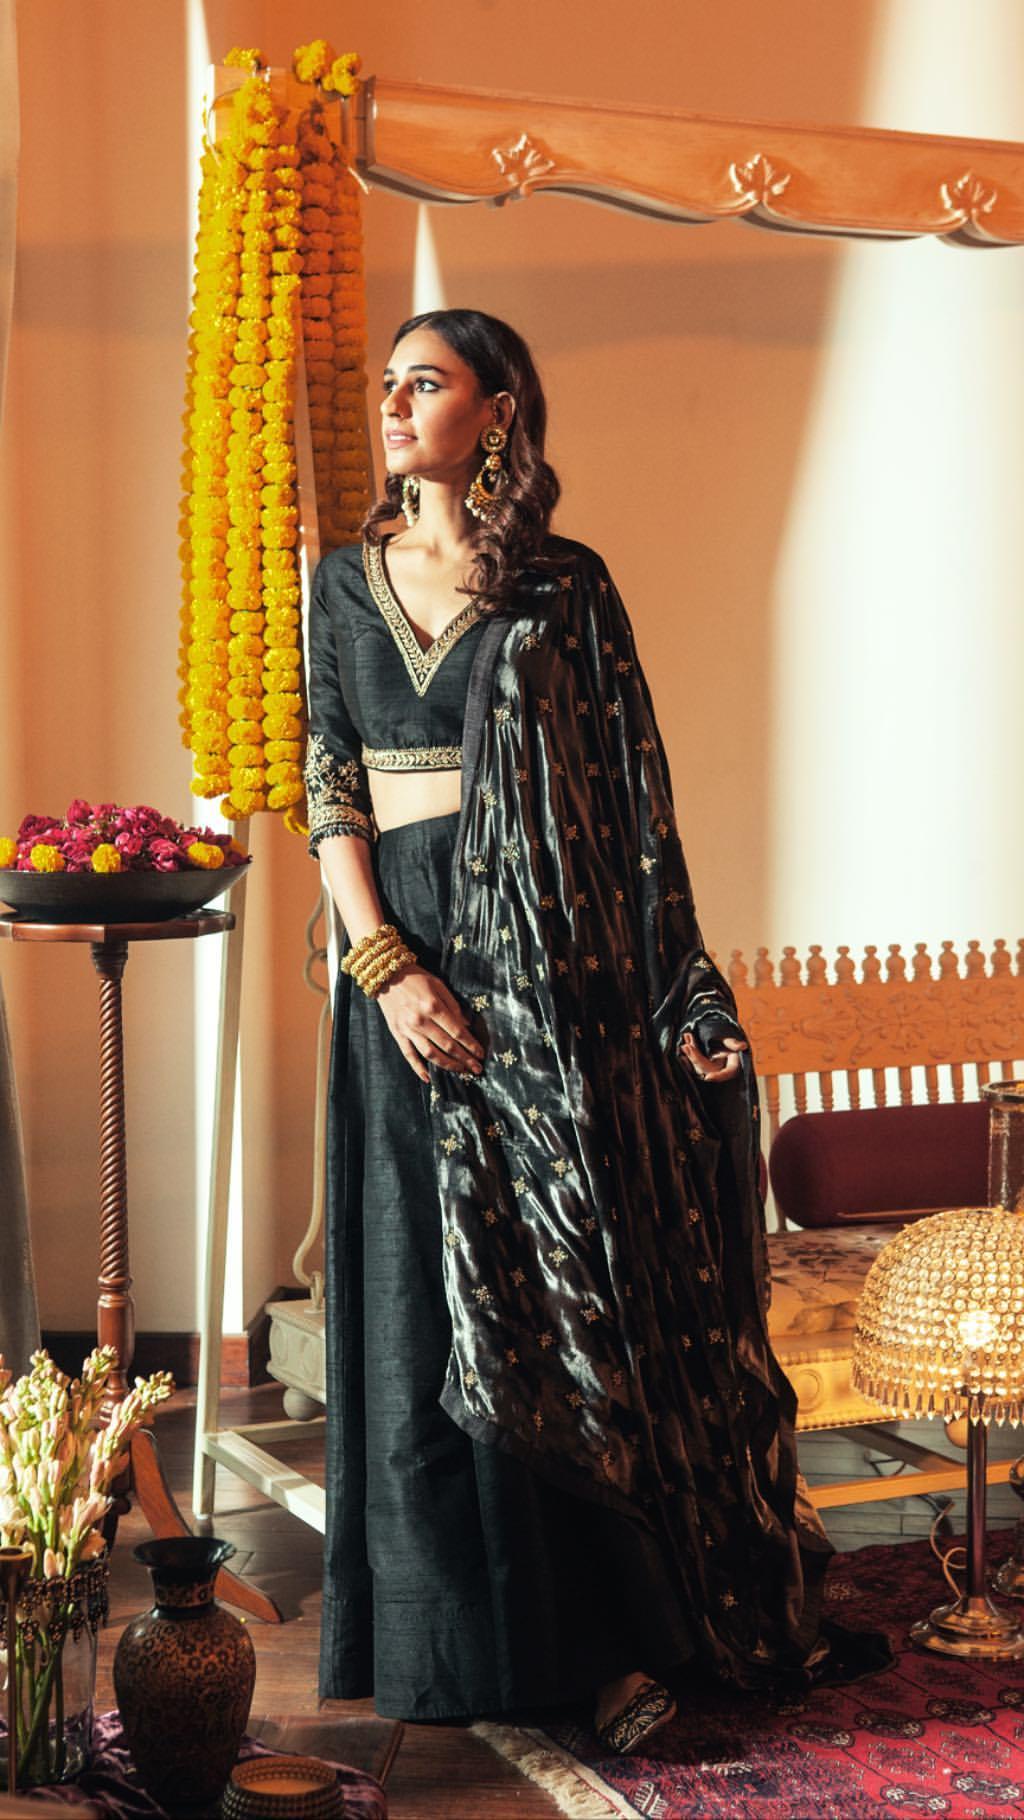 Black lehenga in raw silk with velvet dupatta by designer Sureena Chowdhri GK1 M Block market - Indian wedding outfits for winter